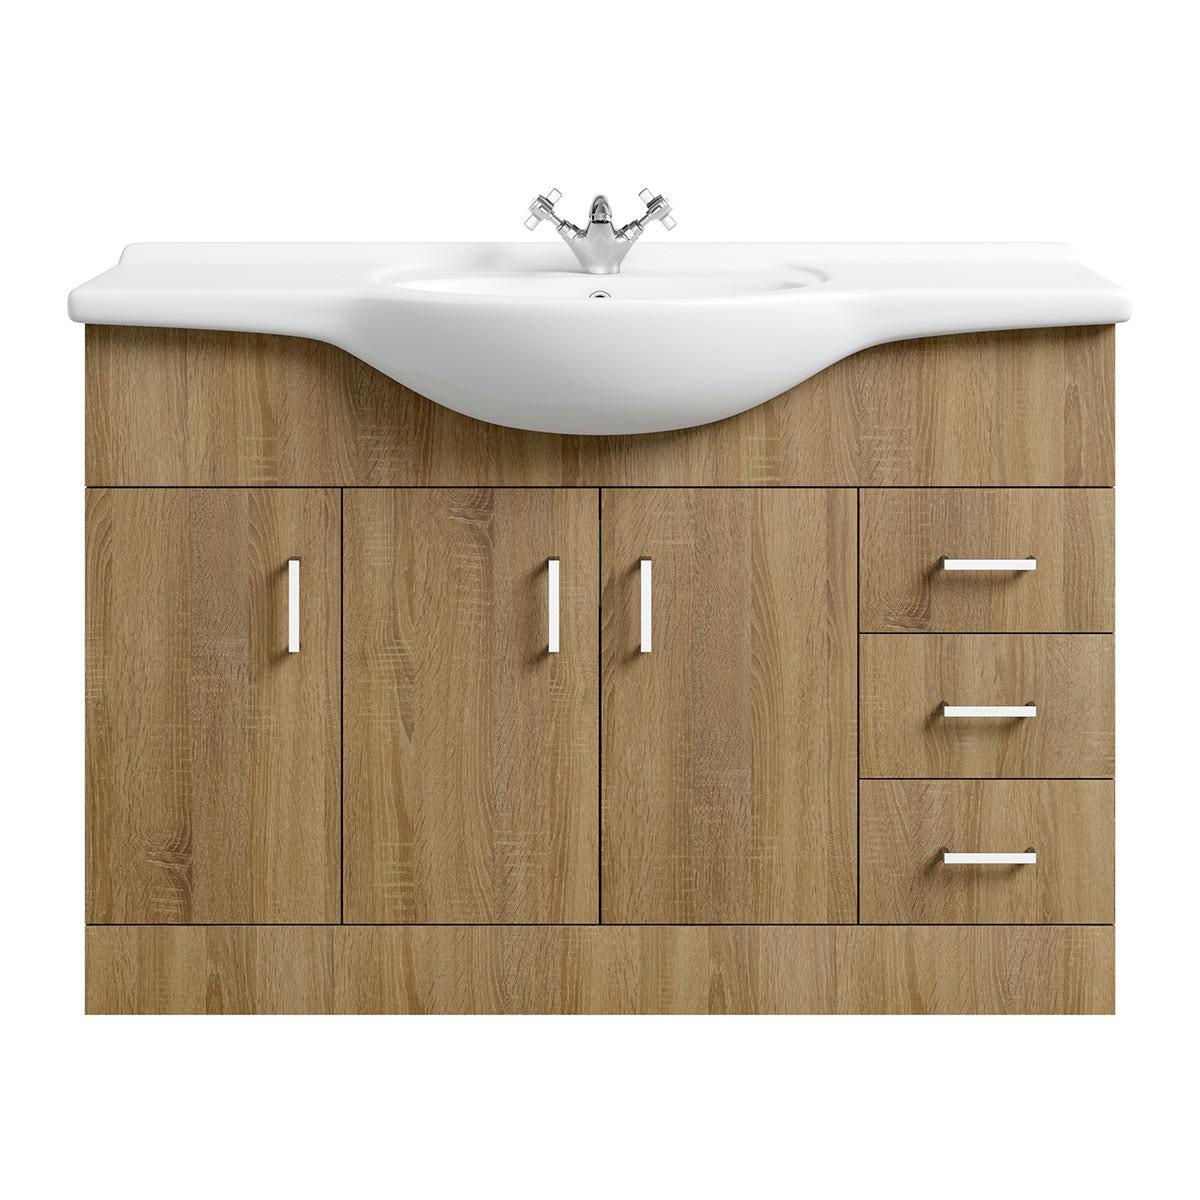 Sienna Oak 120 Vanity Unit   Basin. Sienna Oak 120 Vanity Unit Basin   VictoriaPlum com